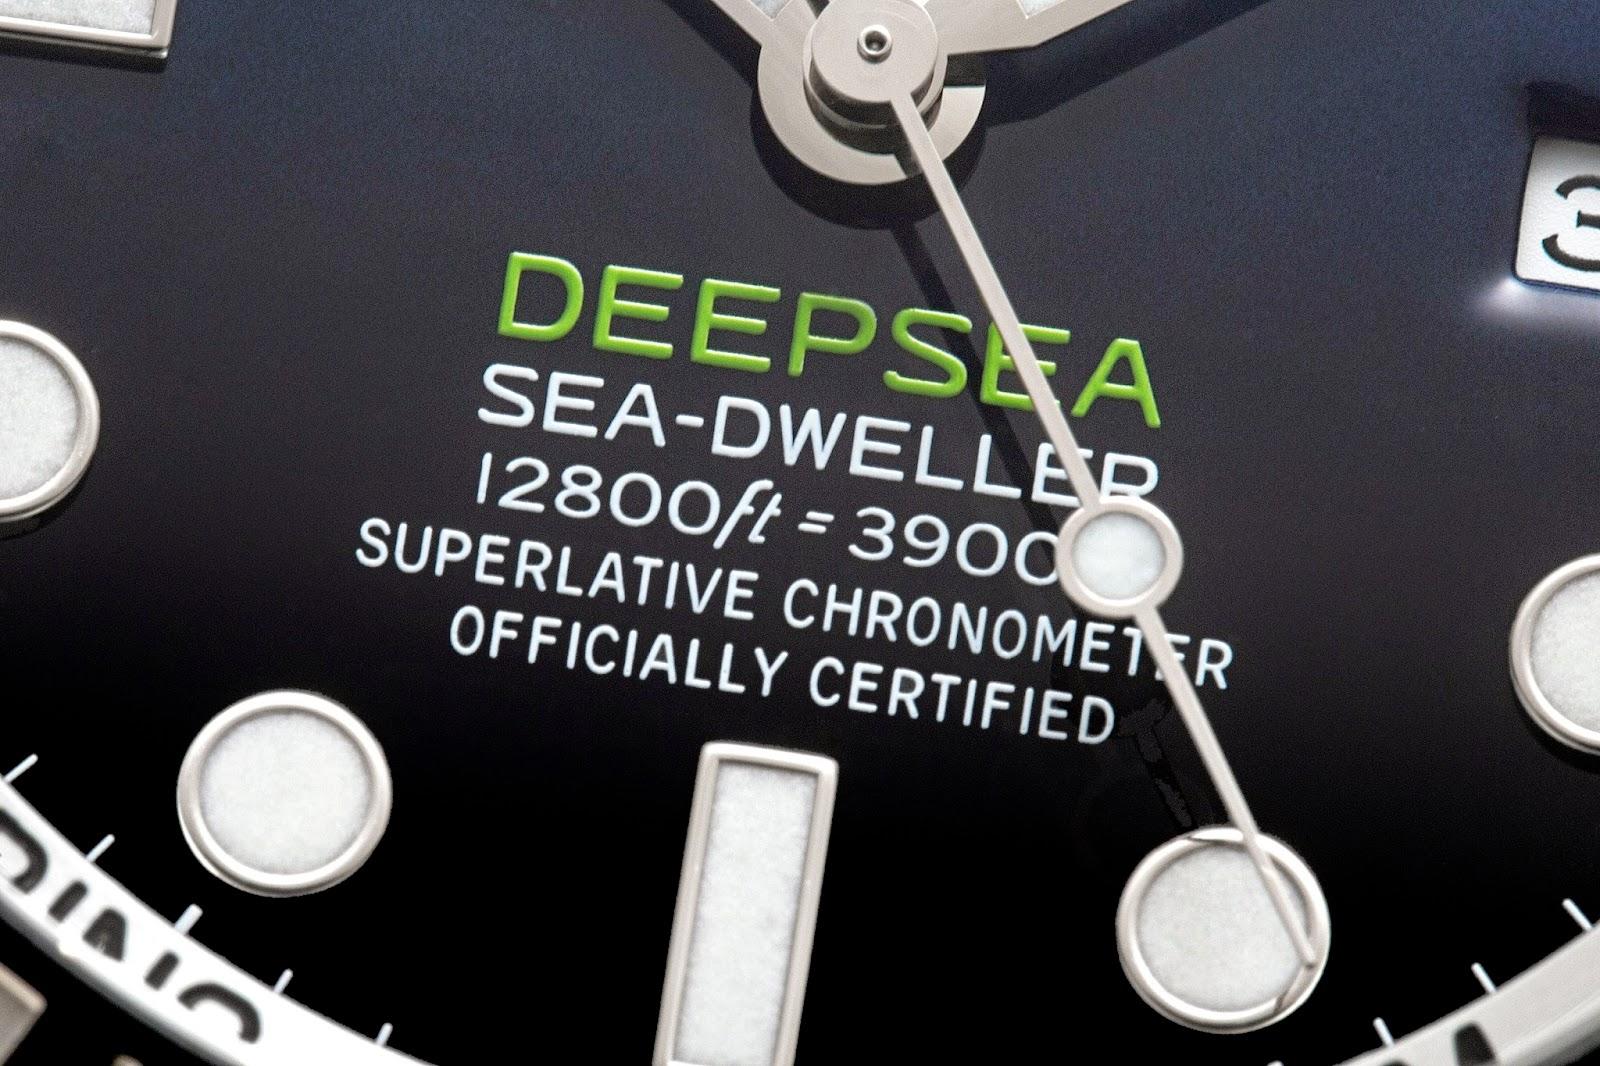 Deepsea D-Blue